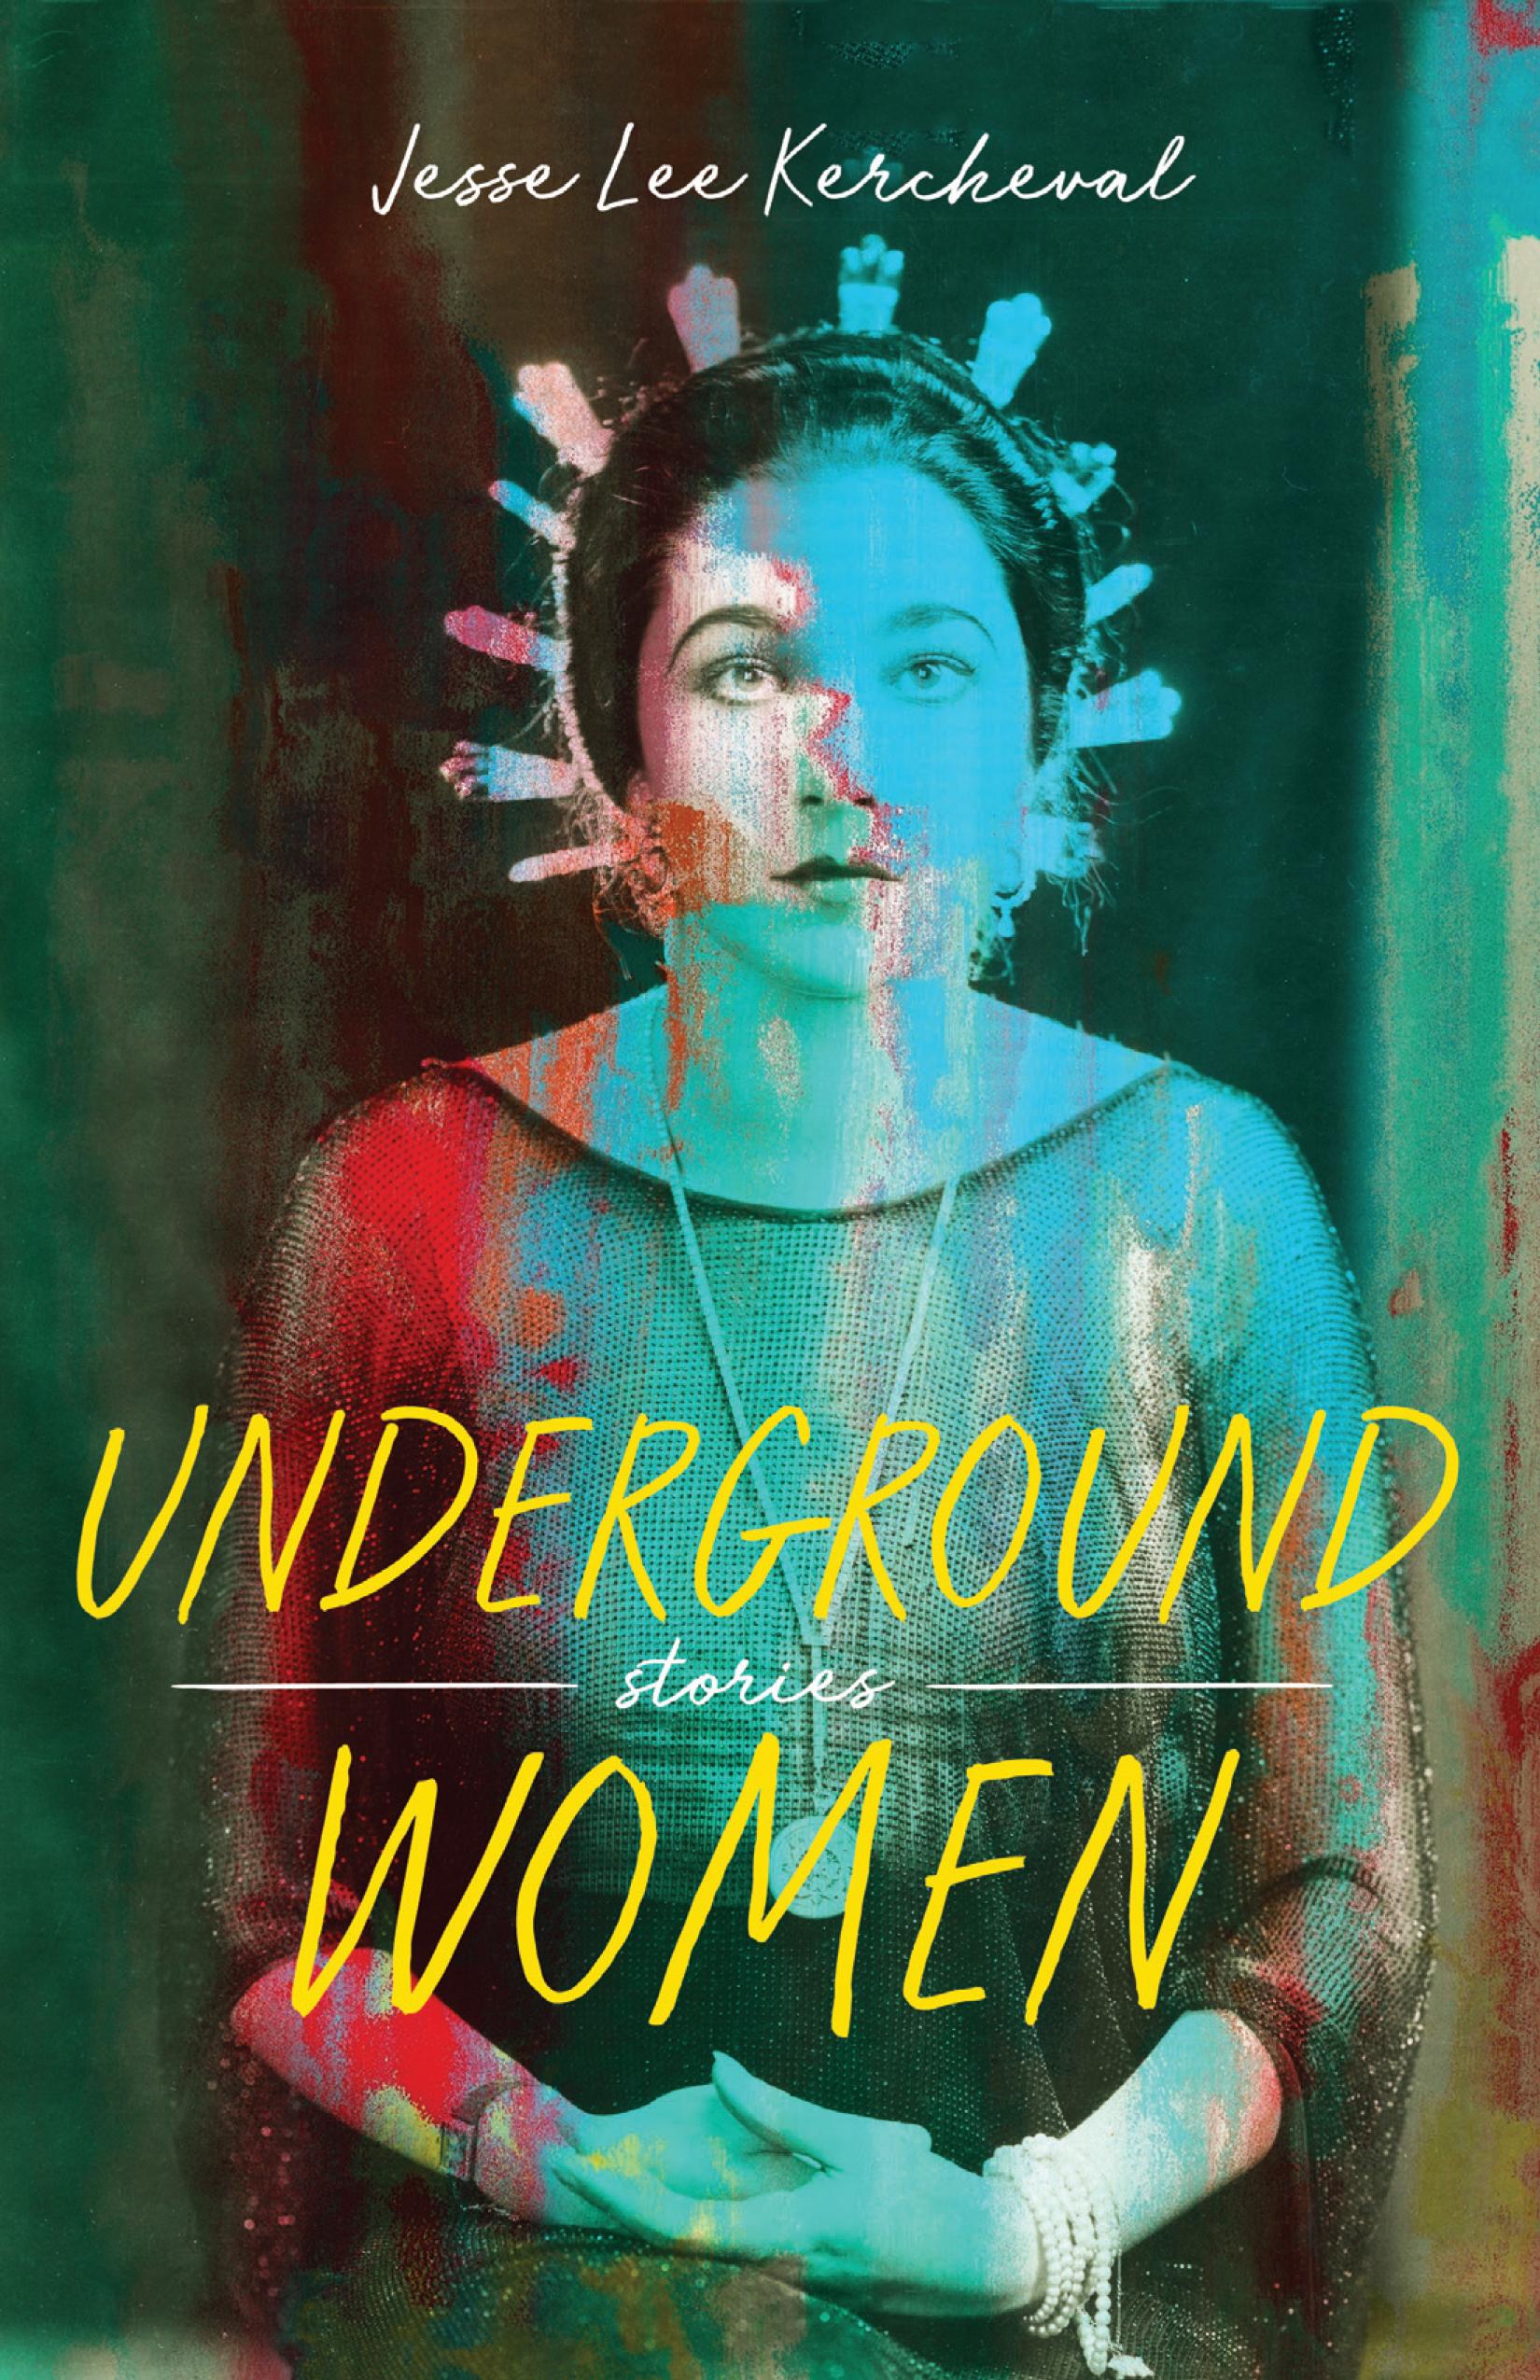 6_Kercheval-UndergroundWomen-c.jpg